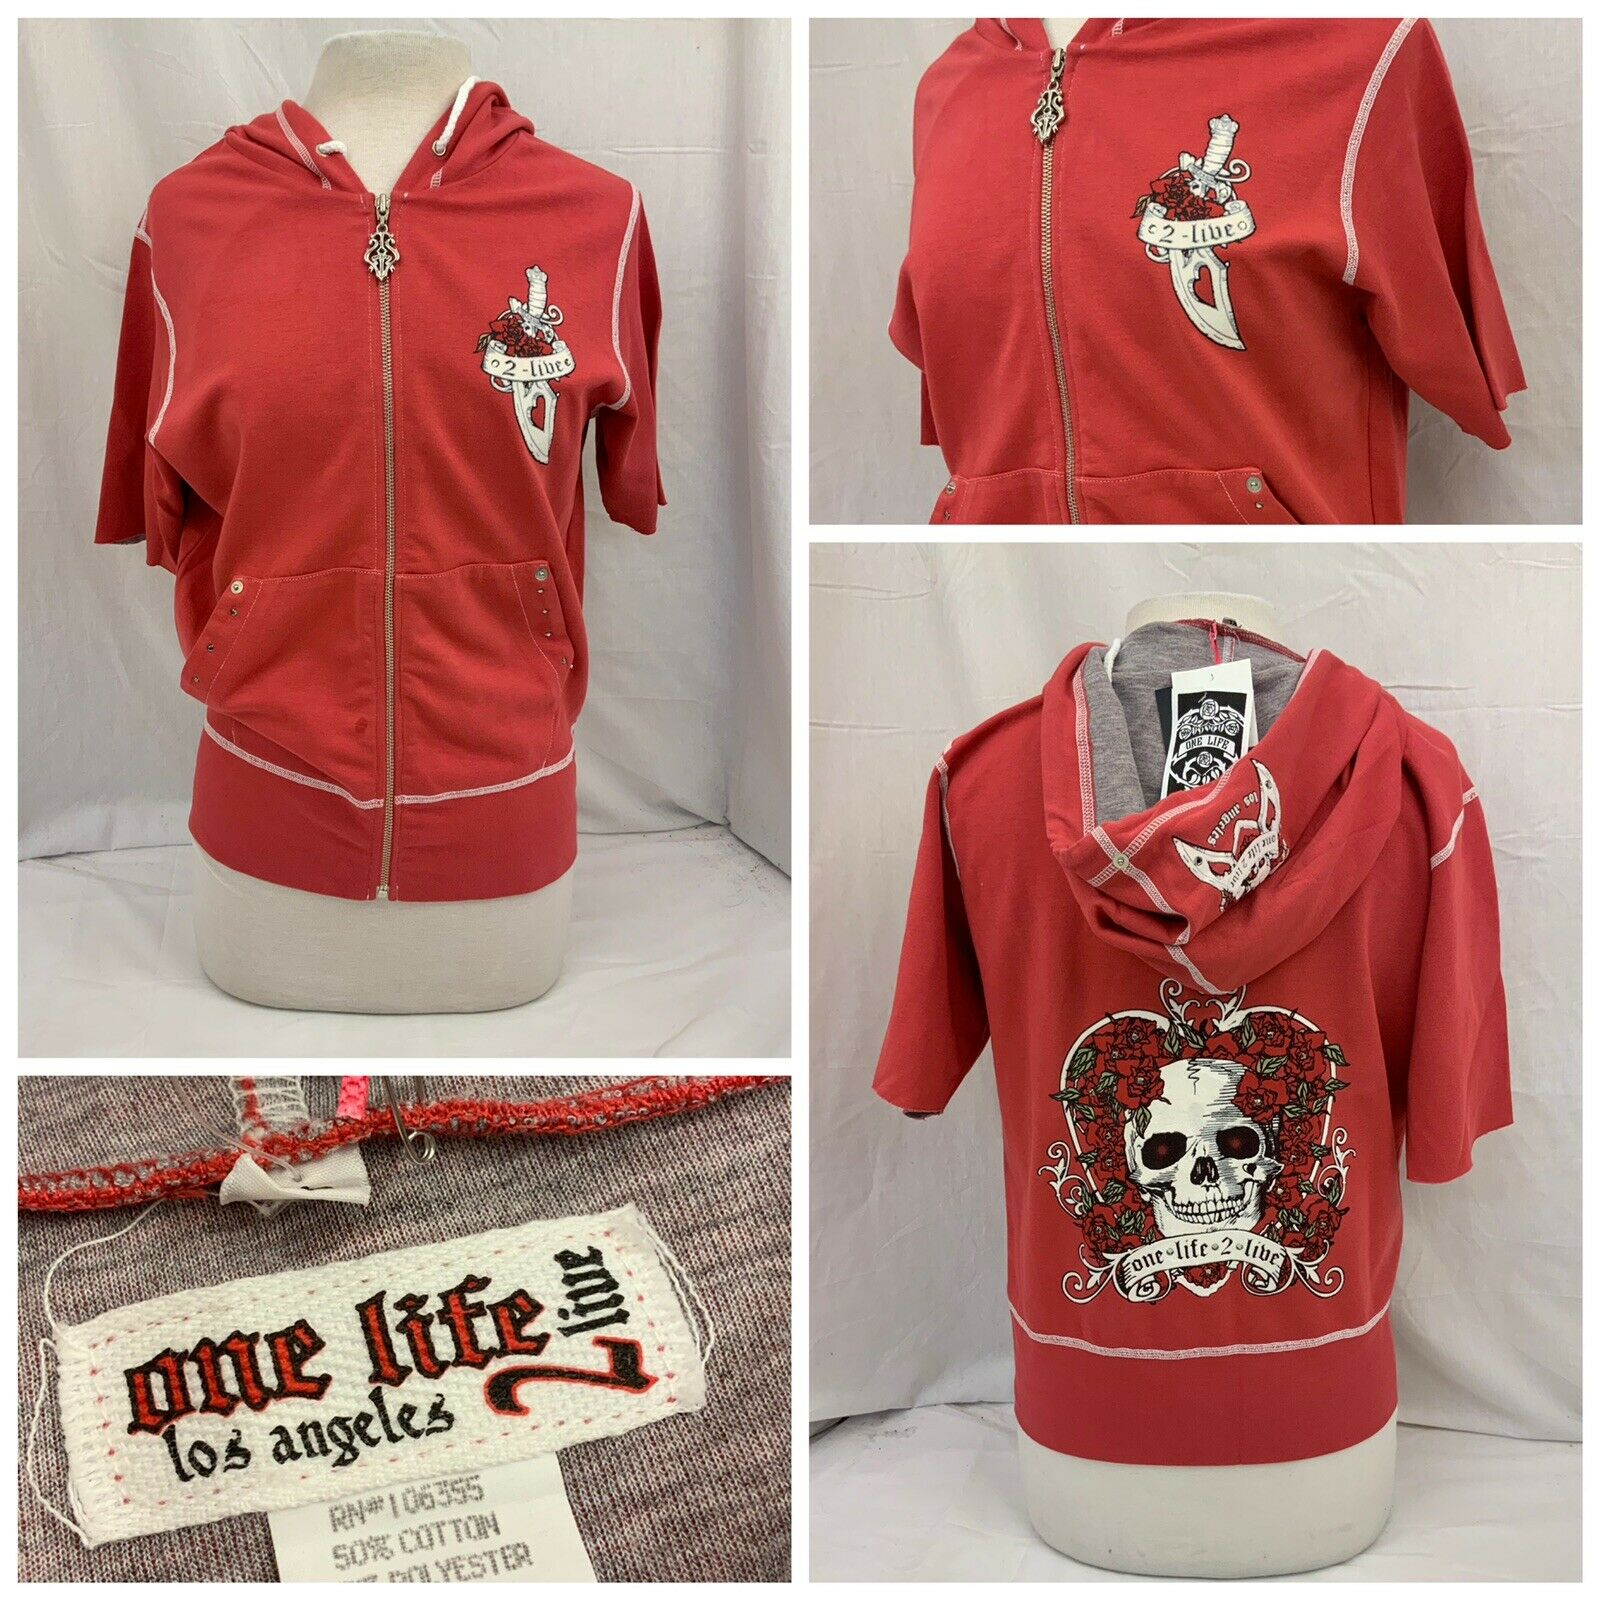 One Life 2 Live Hoodie Sweatshirt XL rot Full Zip Made In USA NWT YGI N9-251CG